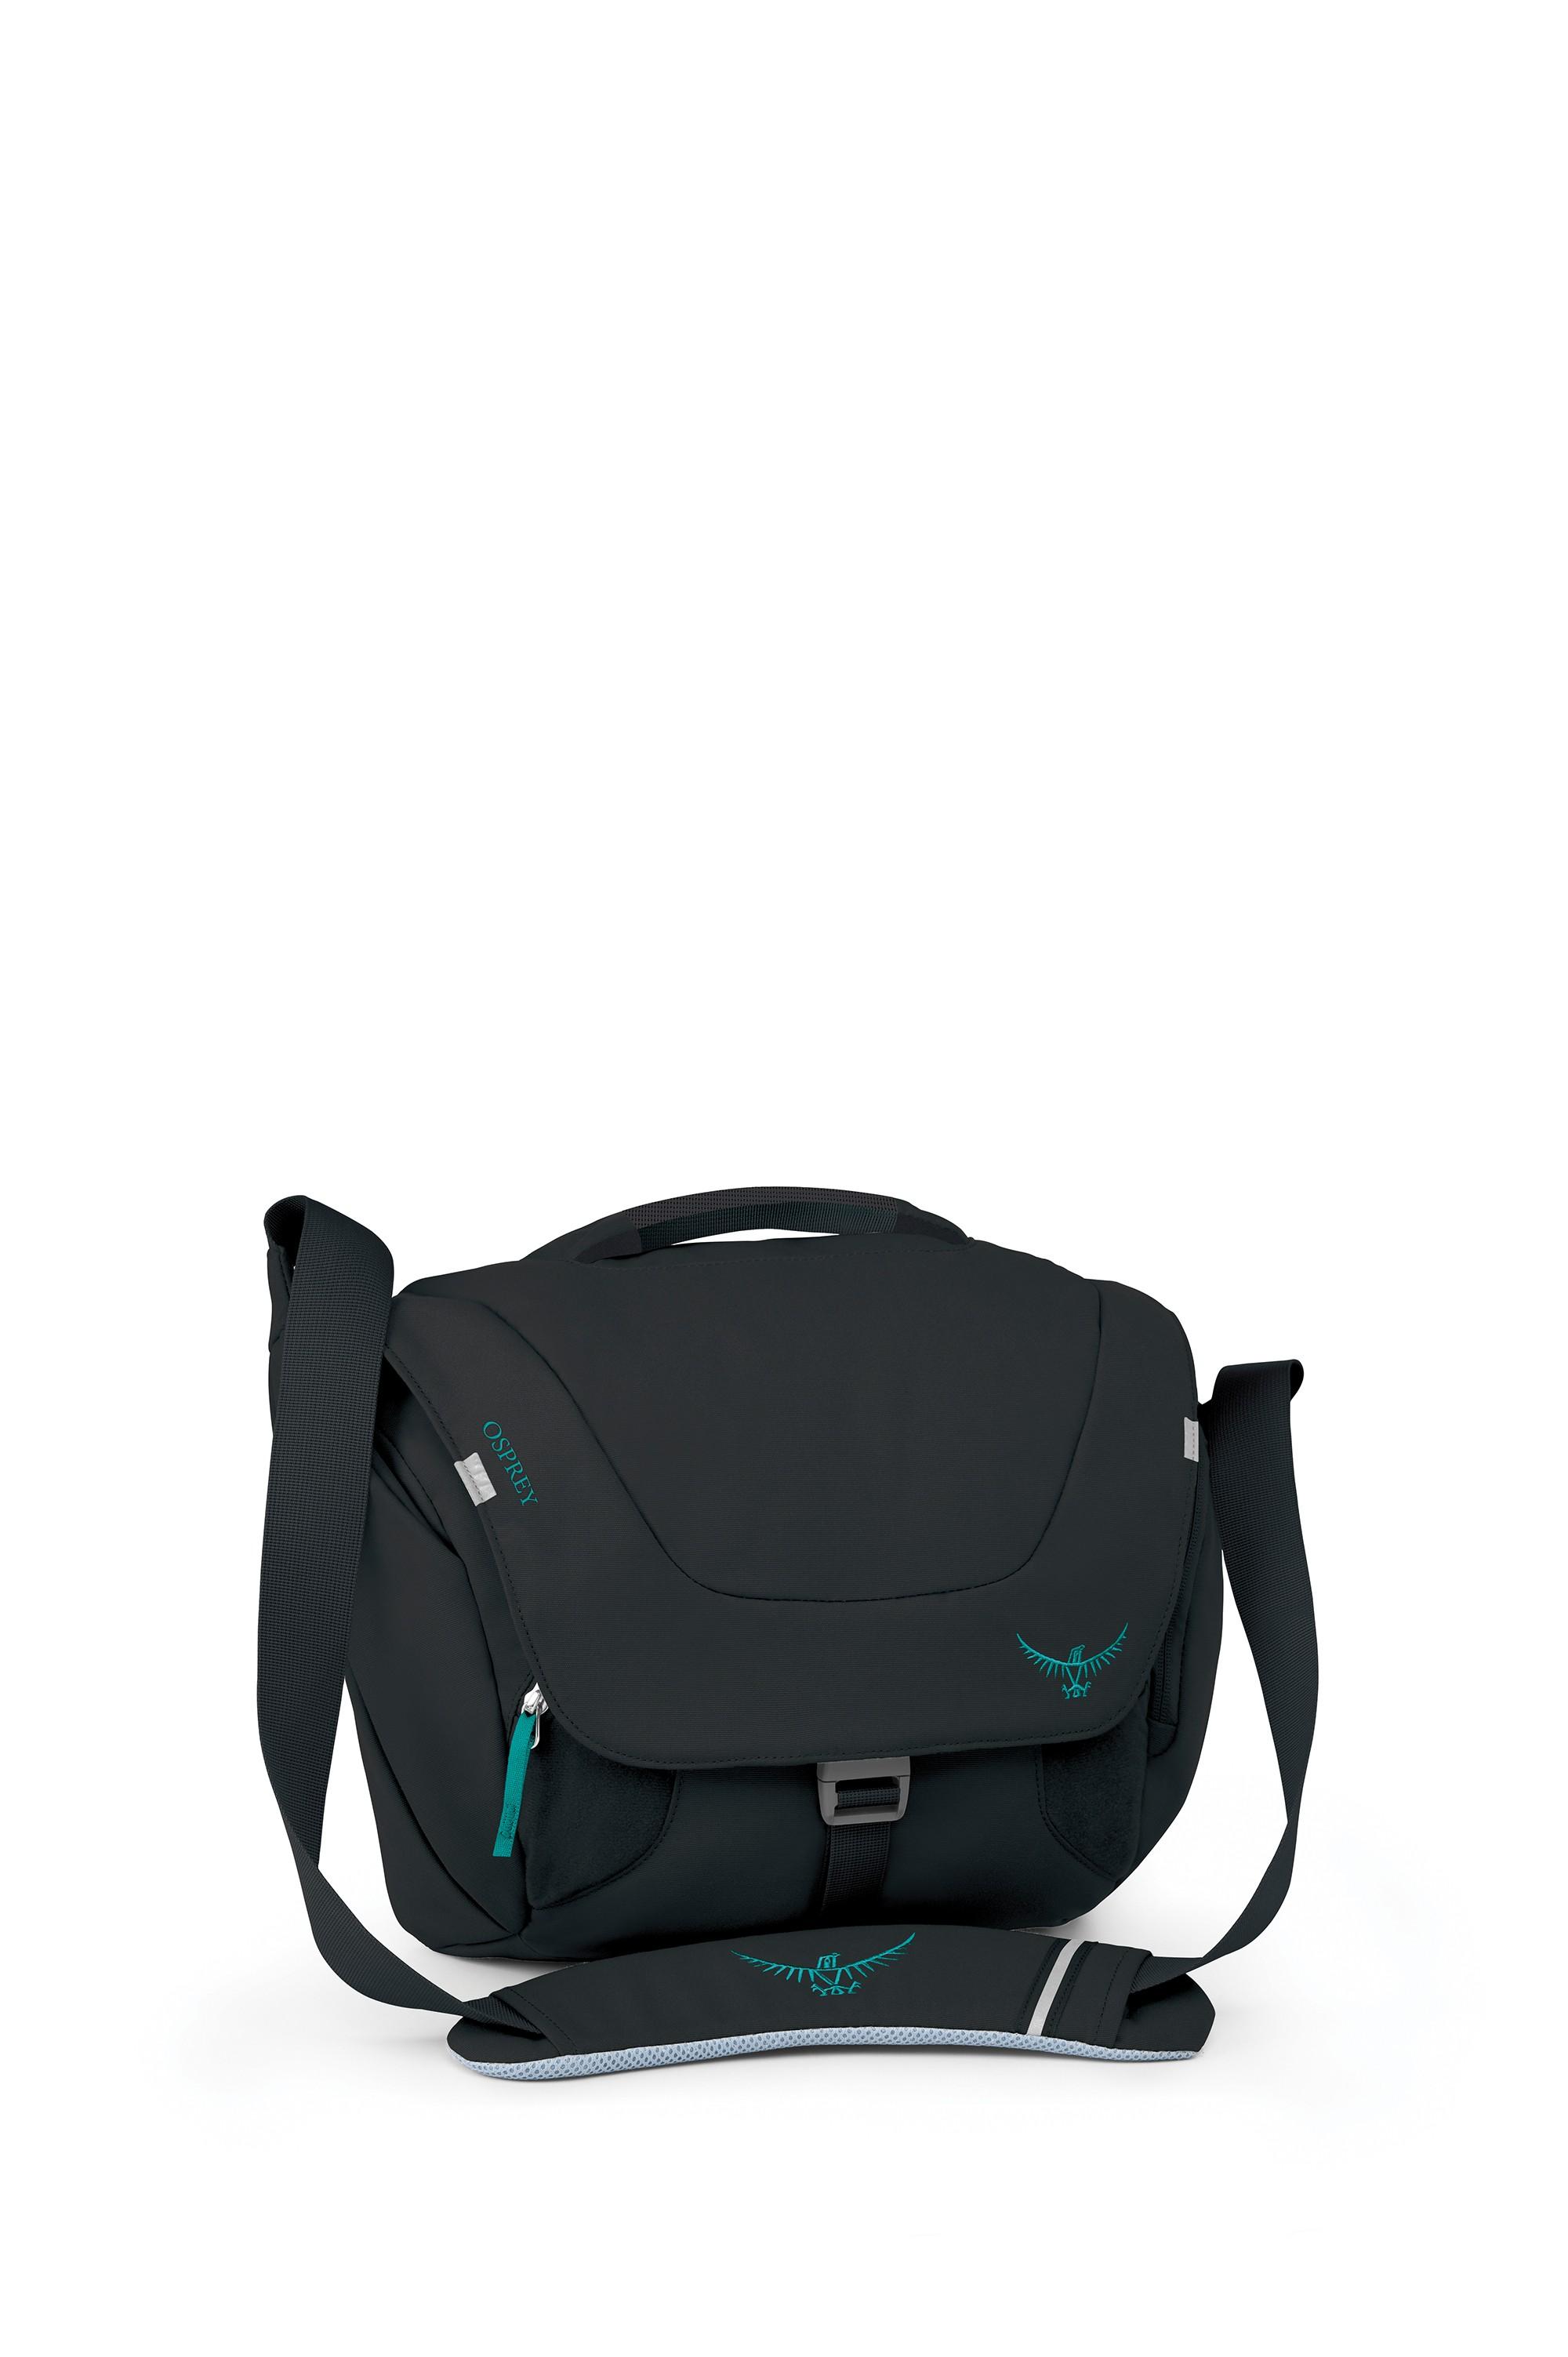 Taška Osprey Flap Jill Courier Mini New Barva: Black